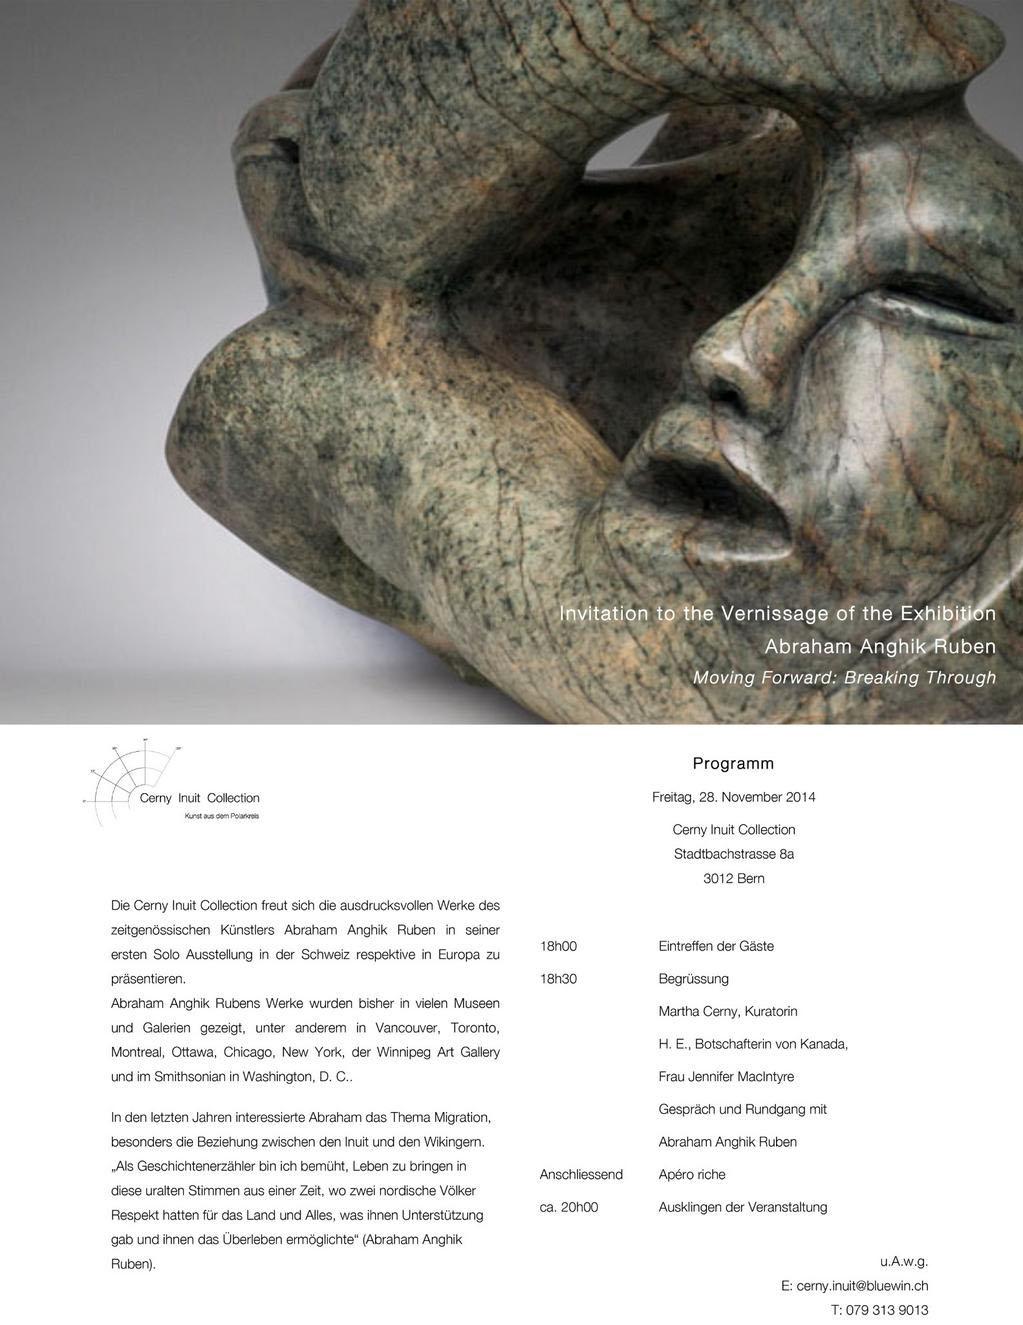 Cerny-Inuit-Collection-Programm1.jpg